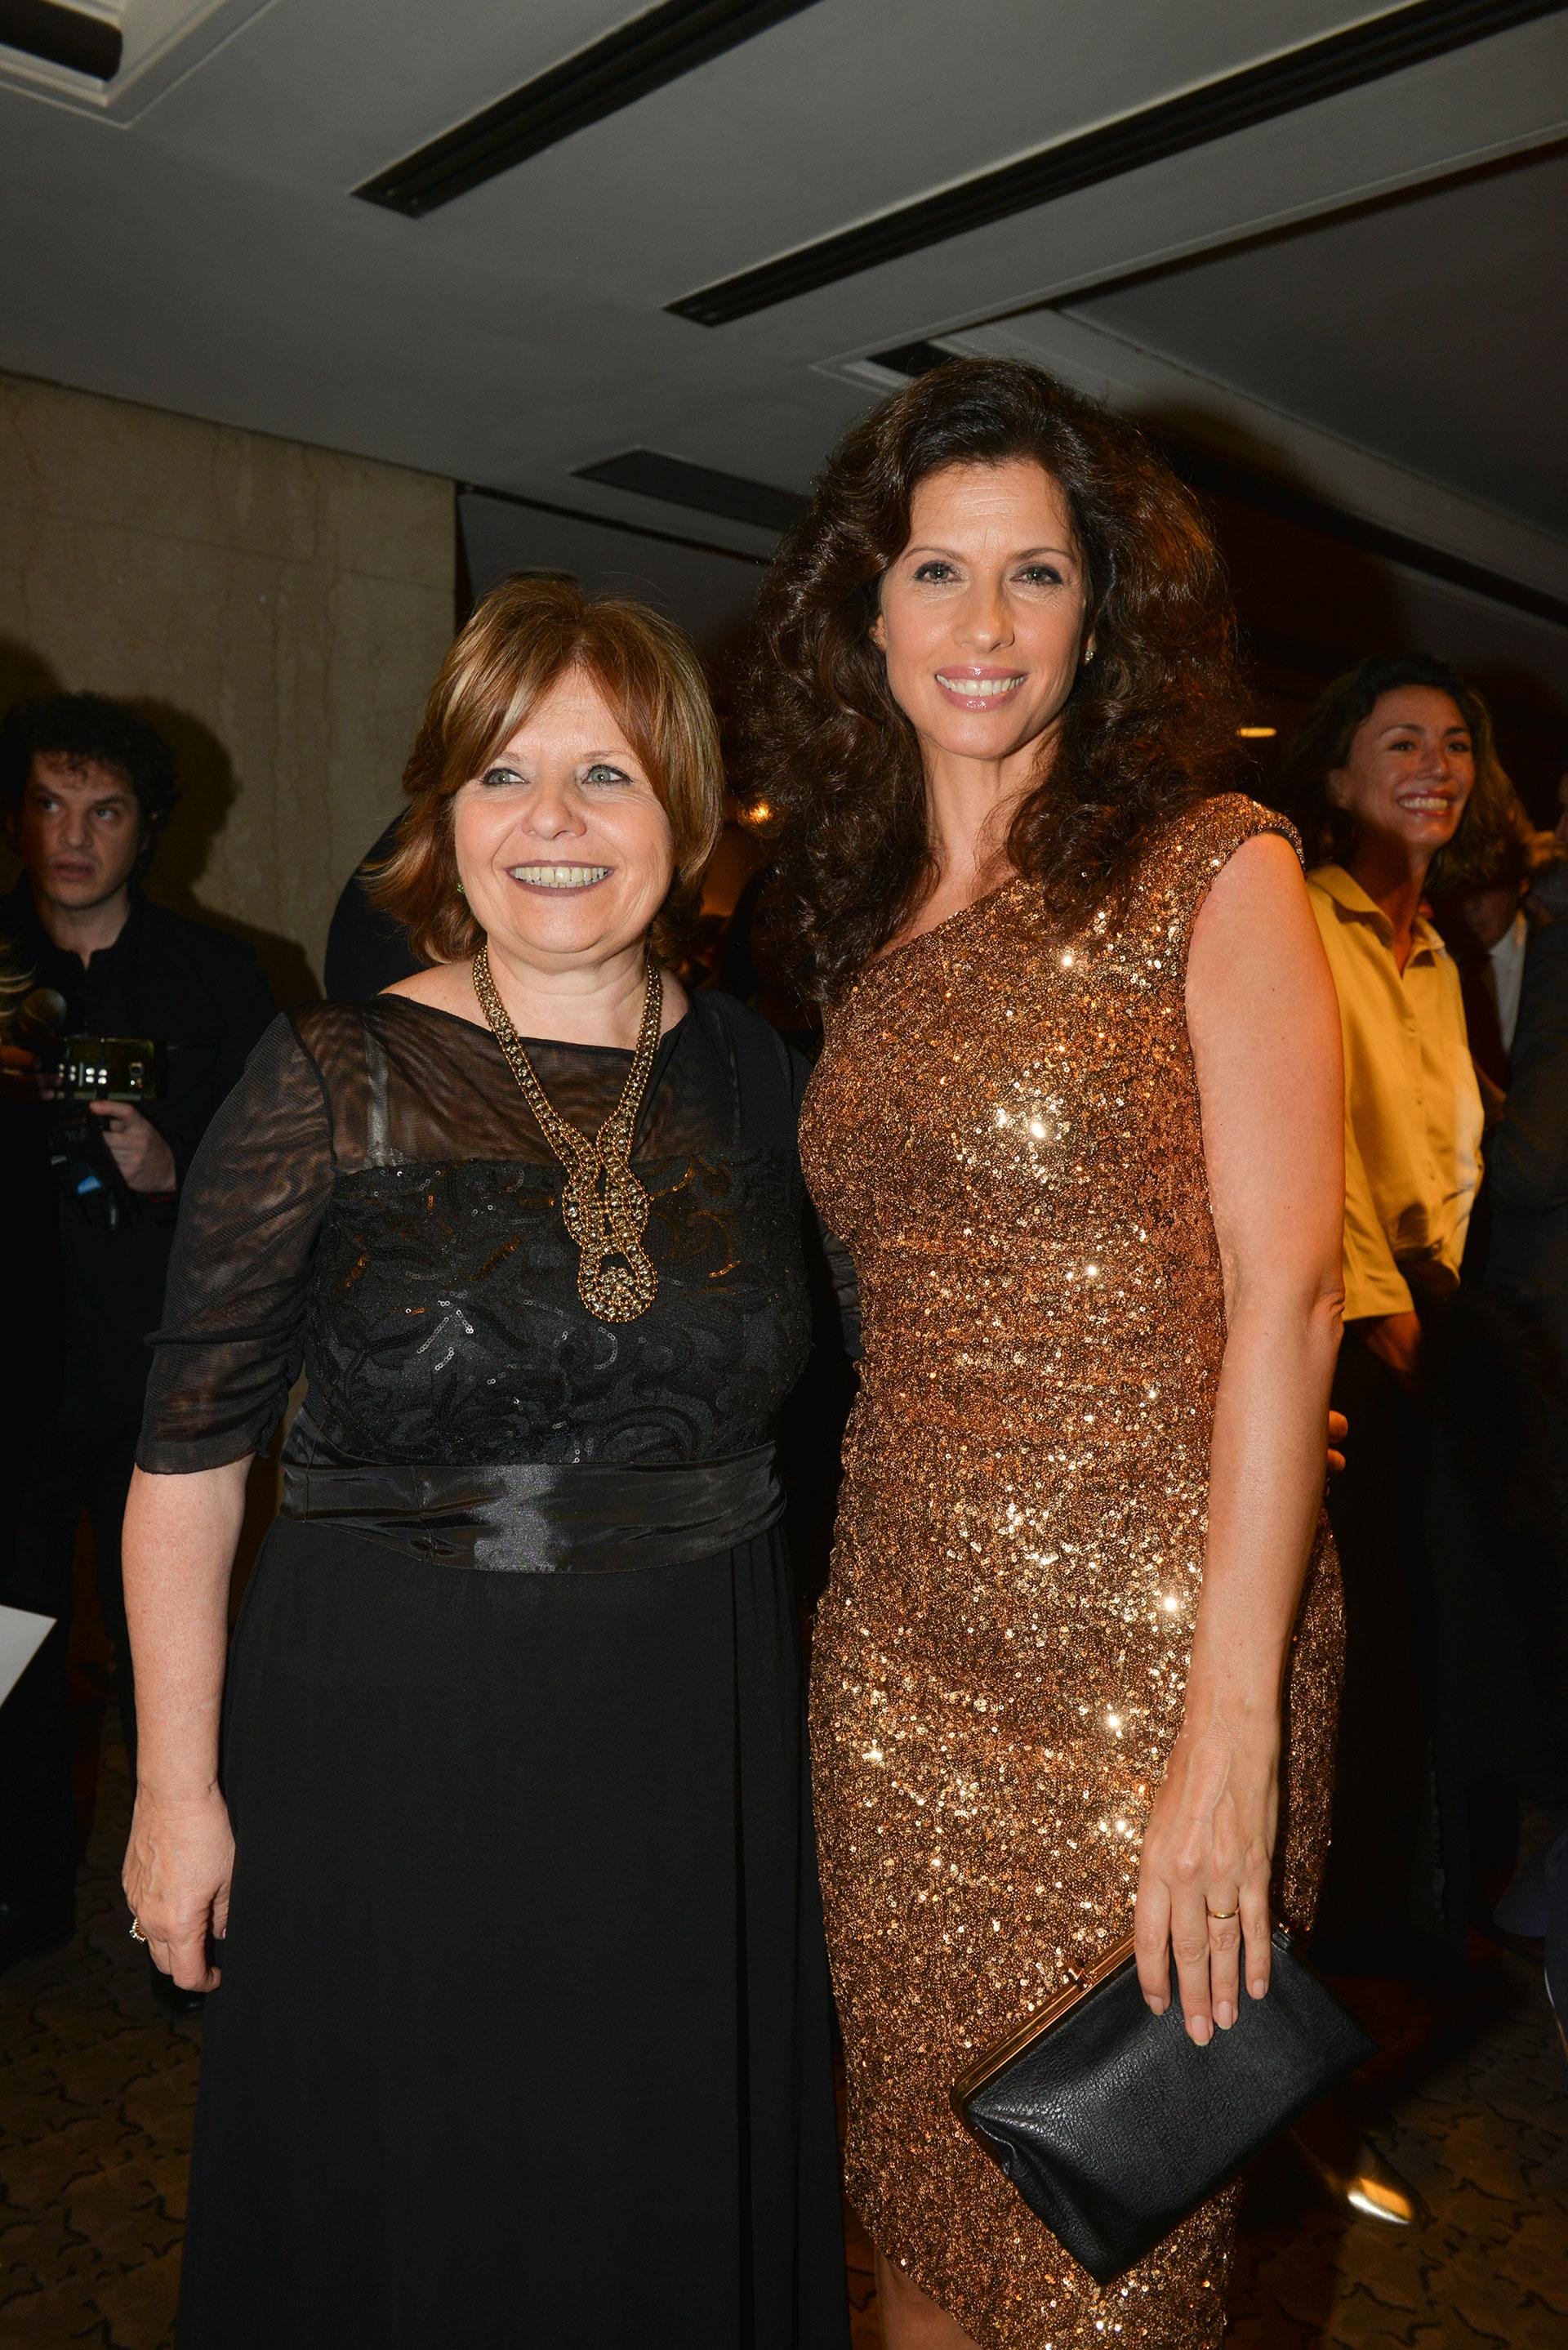 La ministra de Salud porteña, Ana María Bou Pérez y Analía Maiorana.